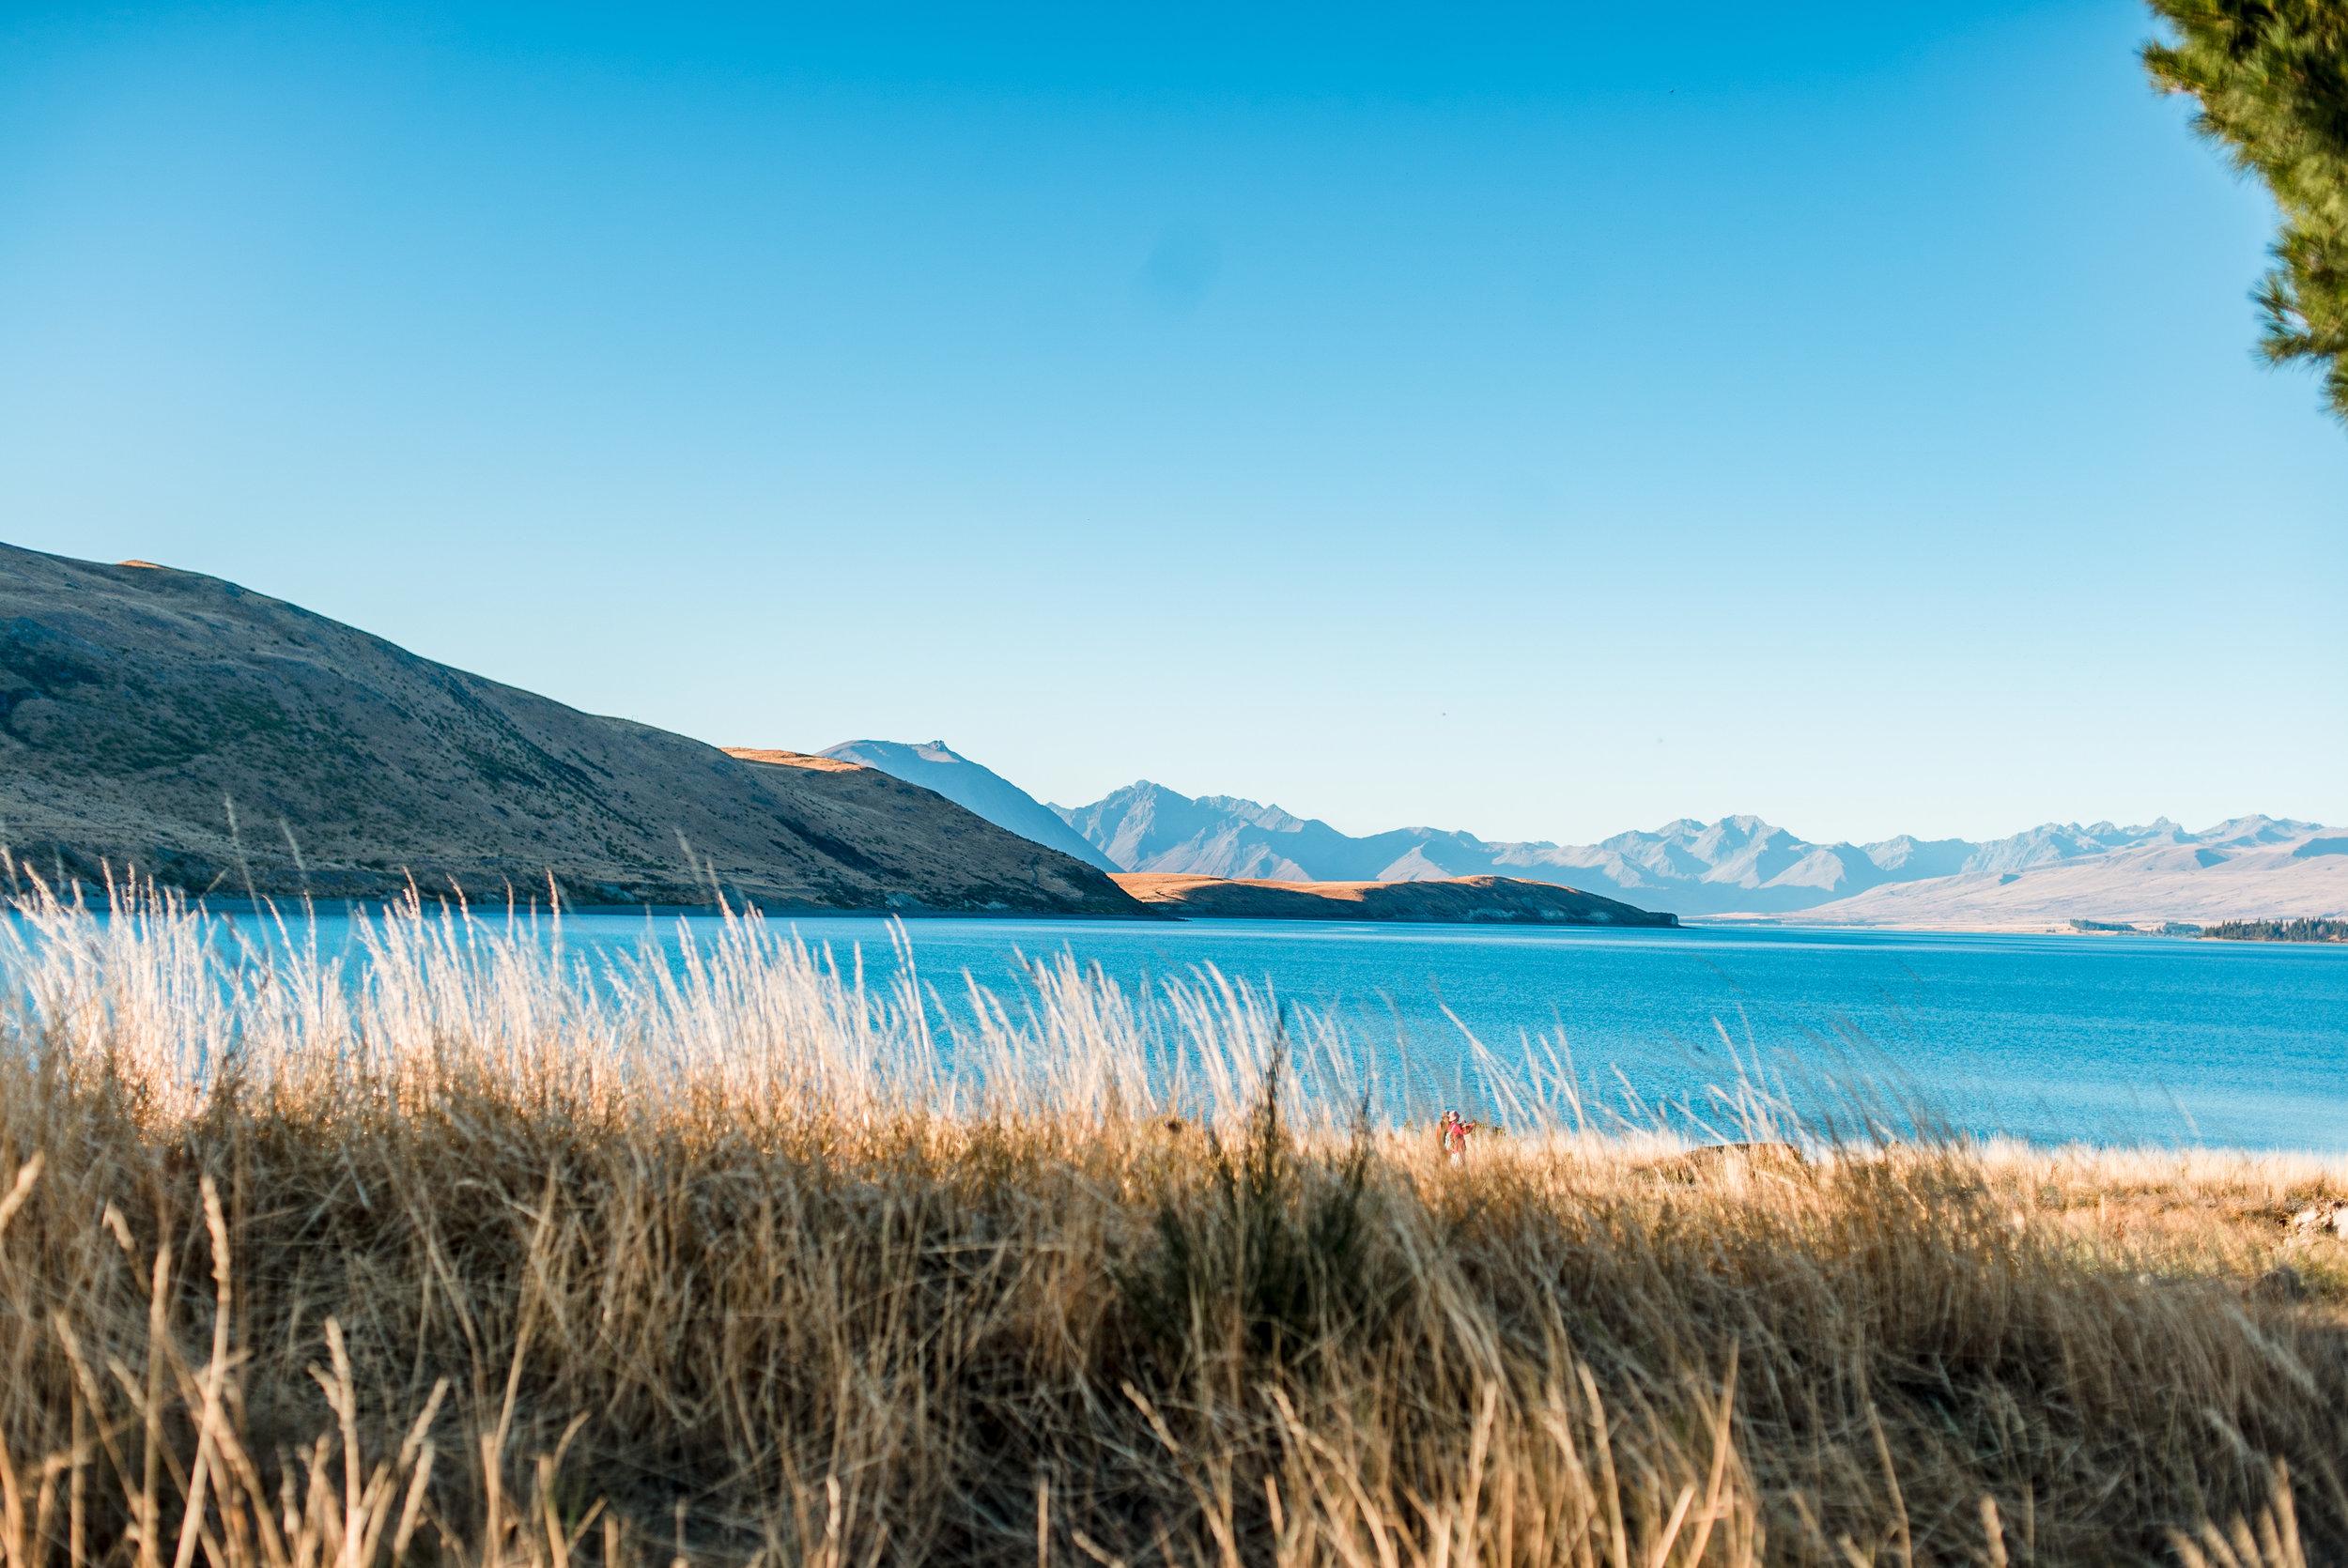 Lake Tekapo. One of New Zealand's countless blue lakes.